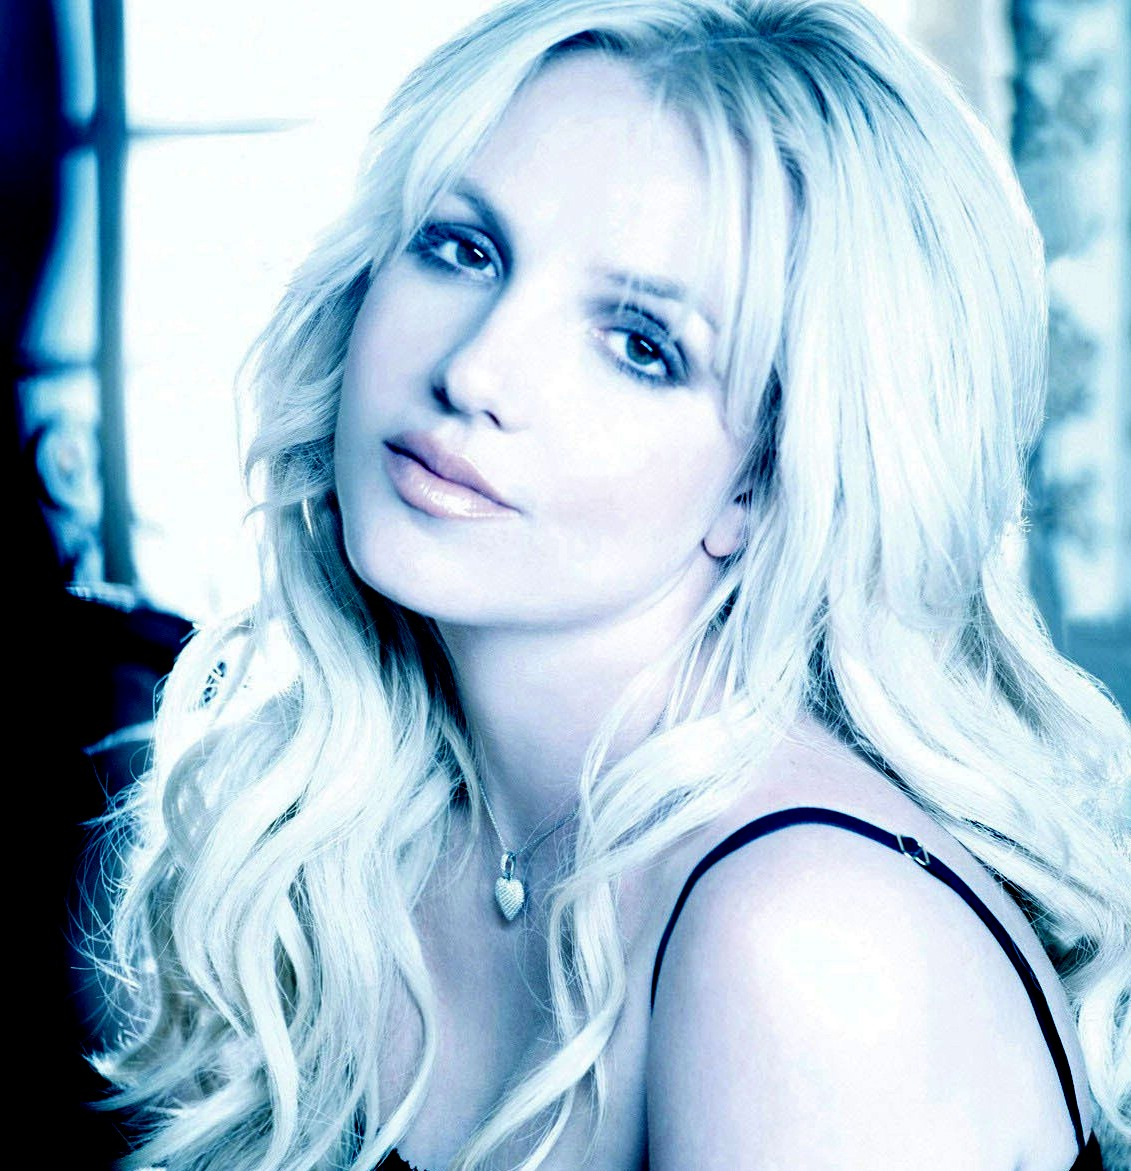 http://2.bp.blogspot.com/-FbzNgu5WLqI/Twf02RsrafI/AAAAAAAAAgU/Qxy5Kaat-Ag/s1600/Britney-Spears-2011-Wallpaper.jpg